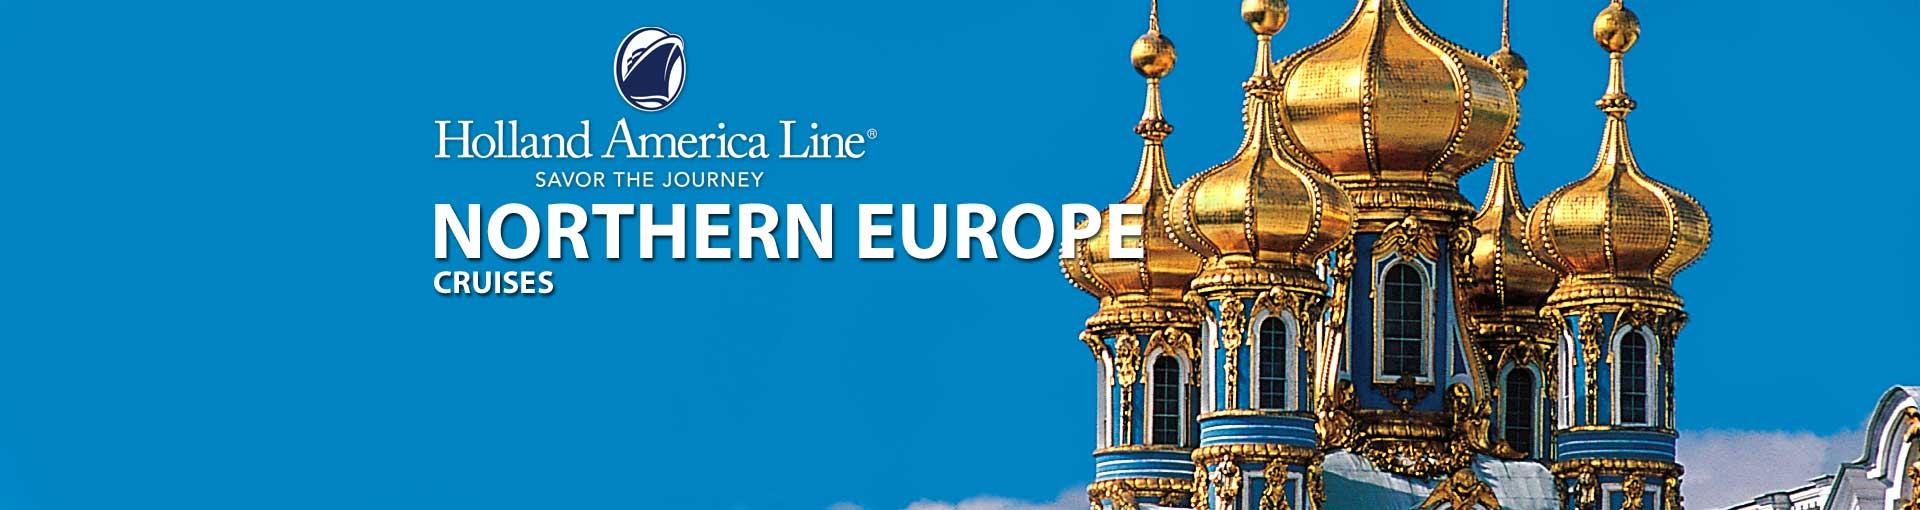 Holland America Northern Europe Cruises